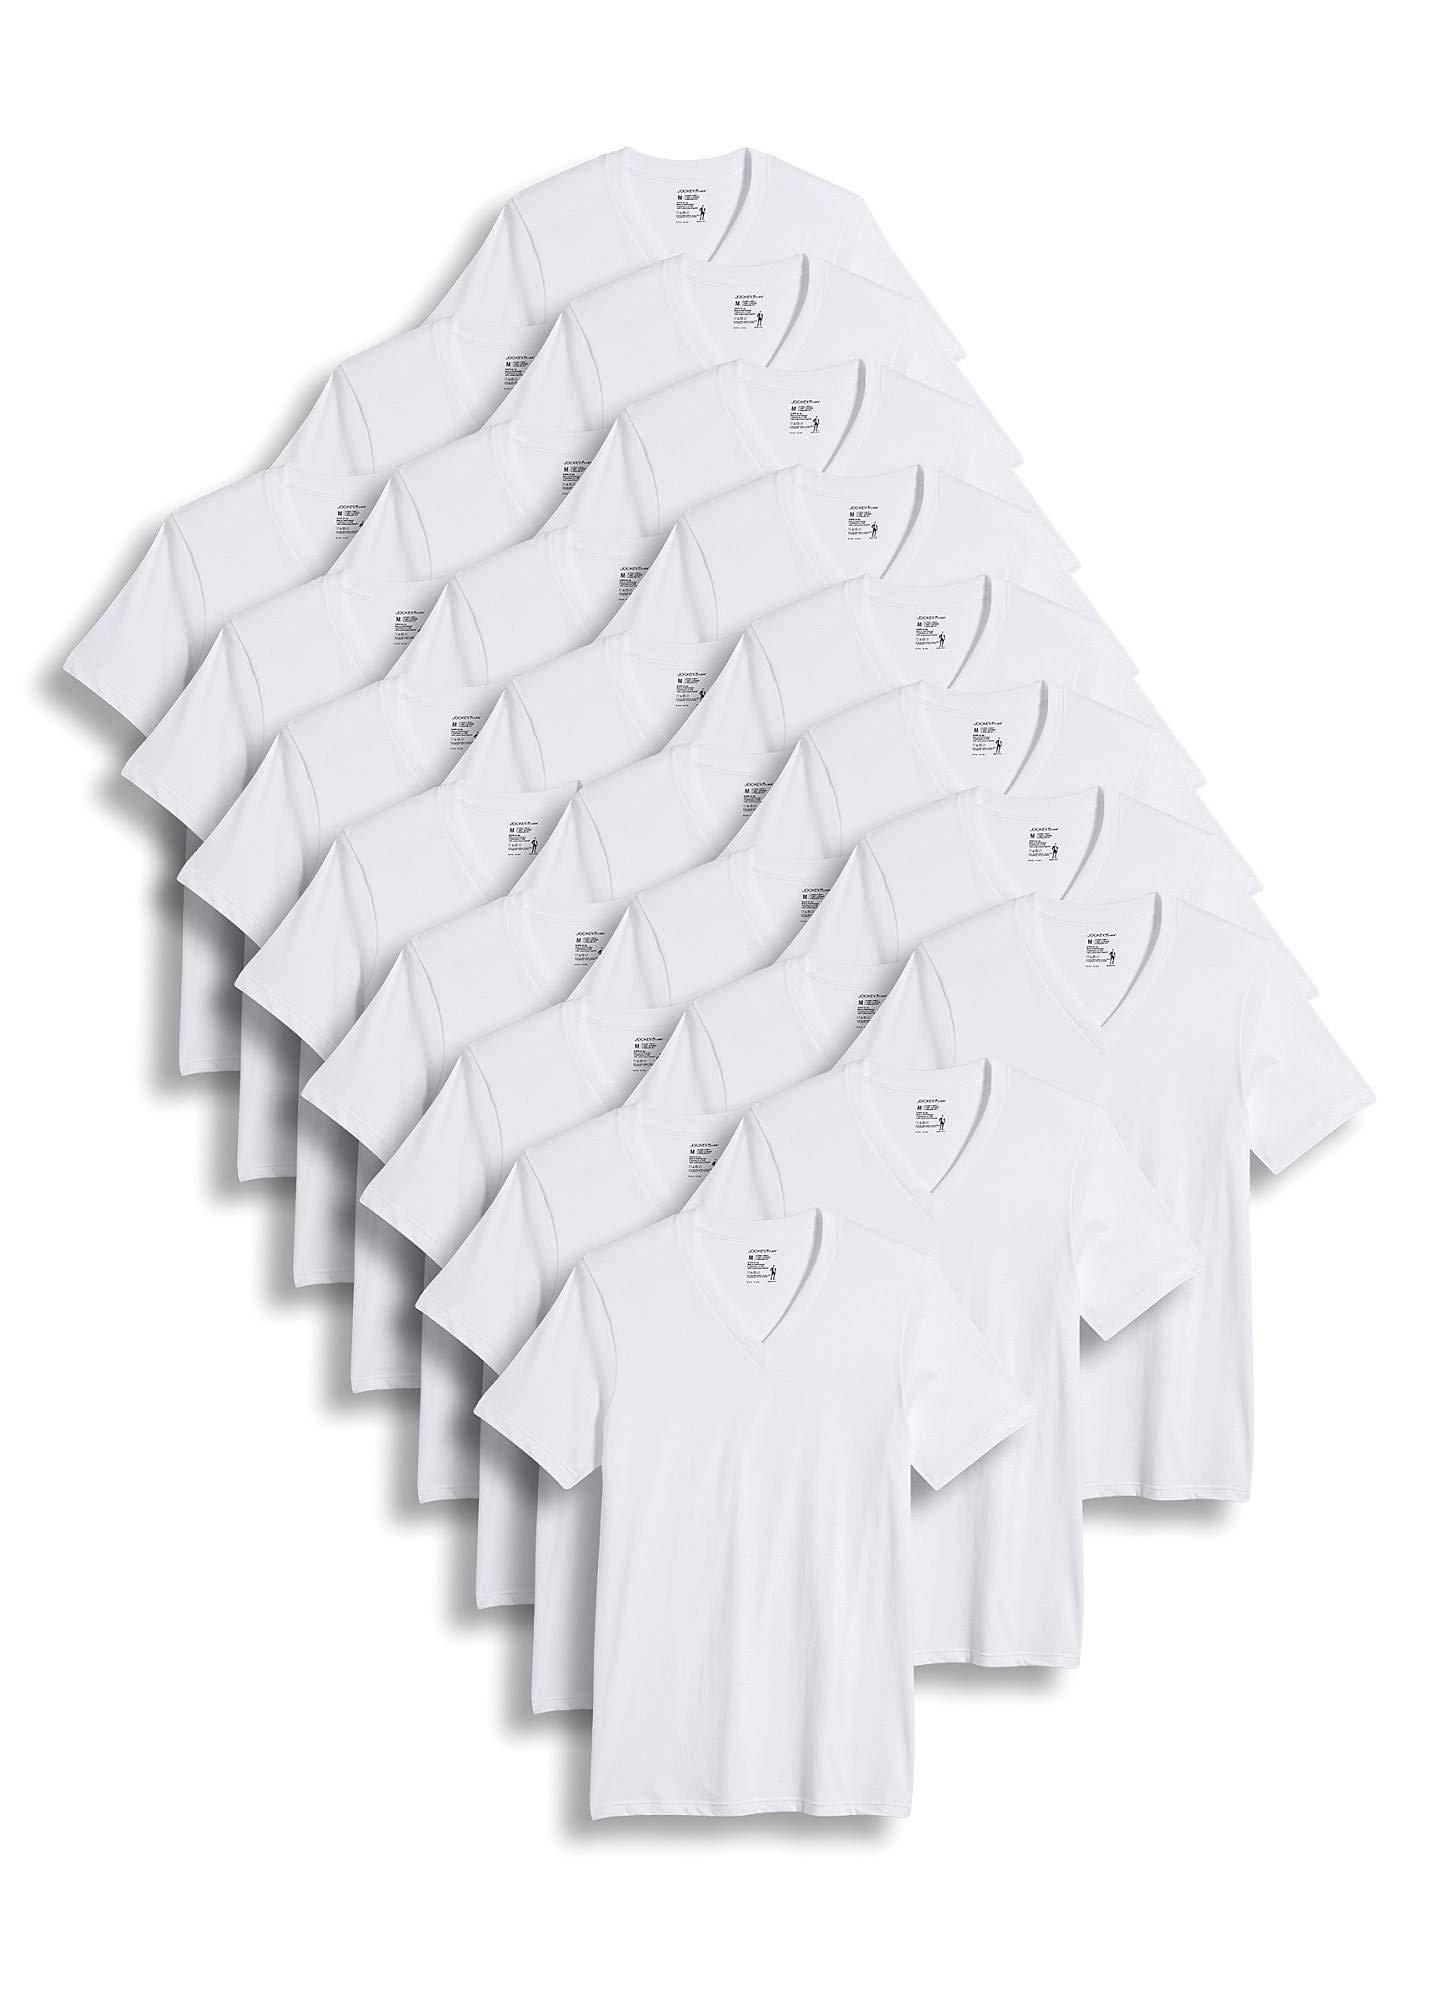 Jockey Men's T-Shirts Classic V-Neck T-Shirt - 24 Pack, White, L